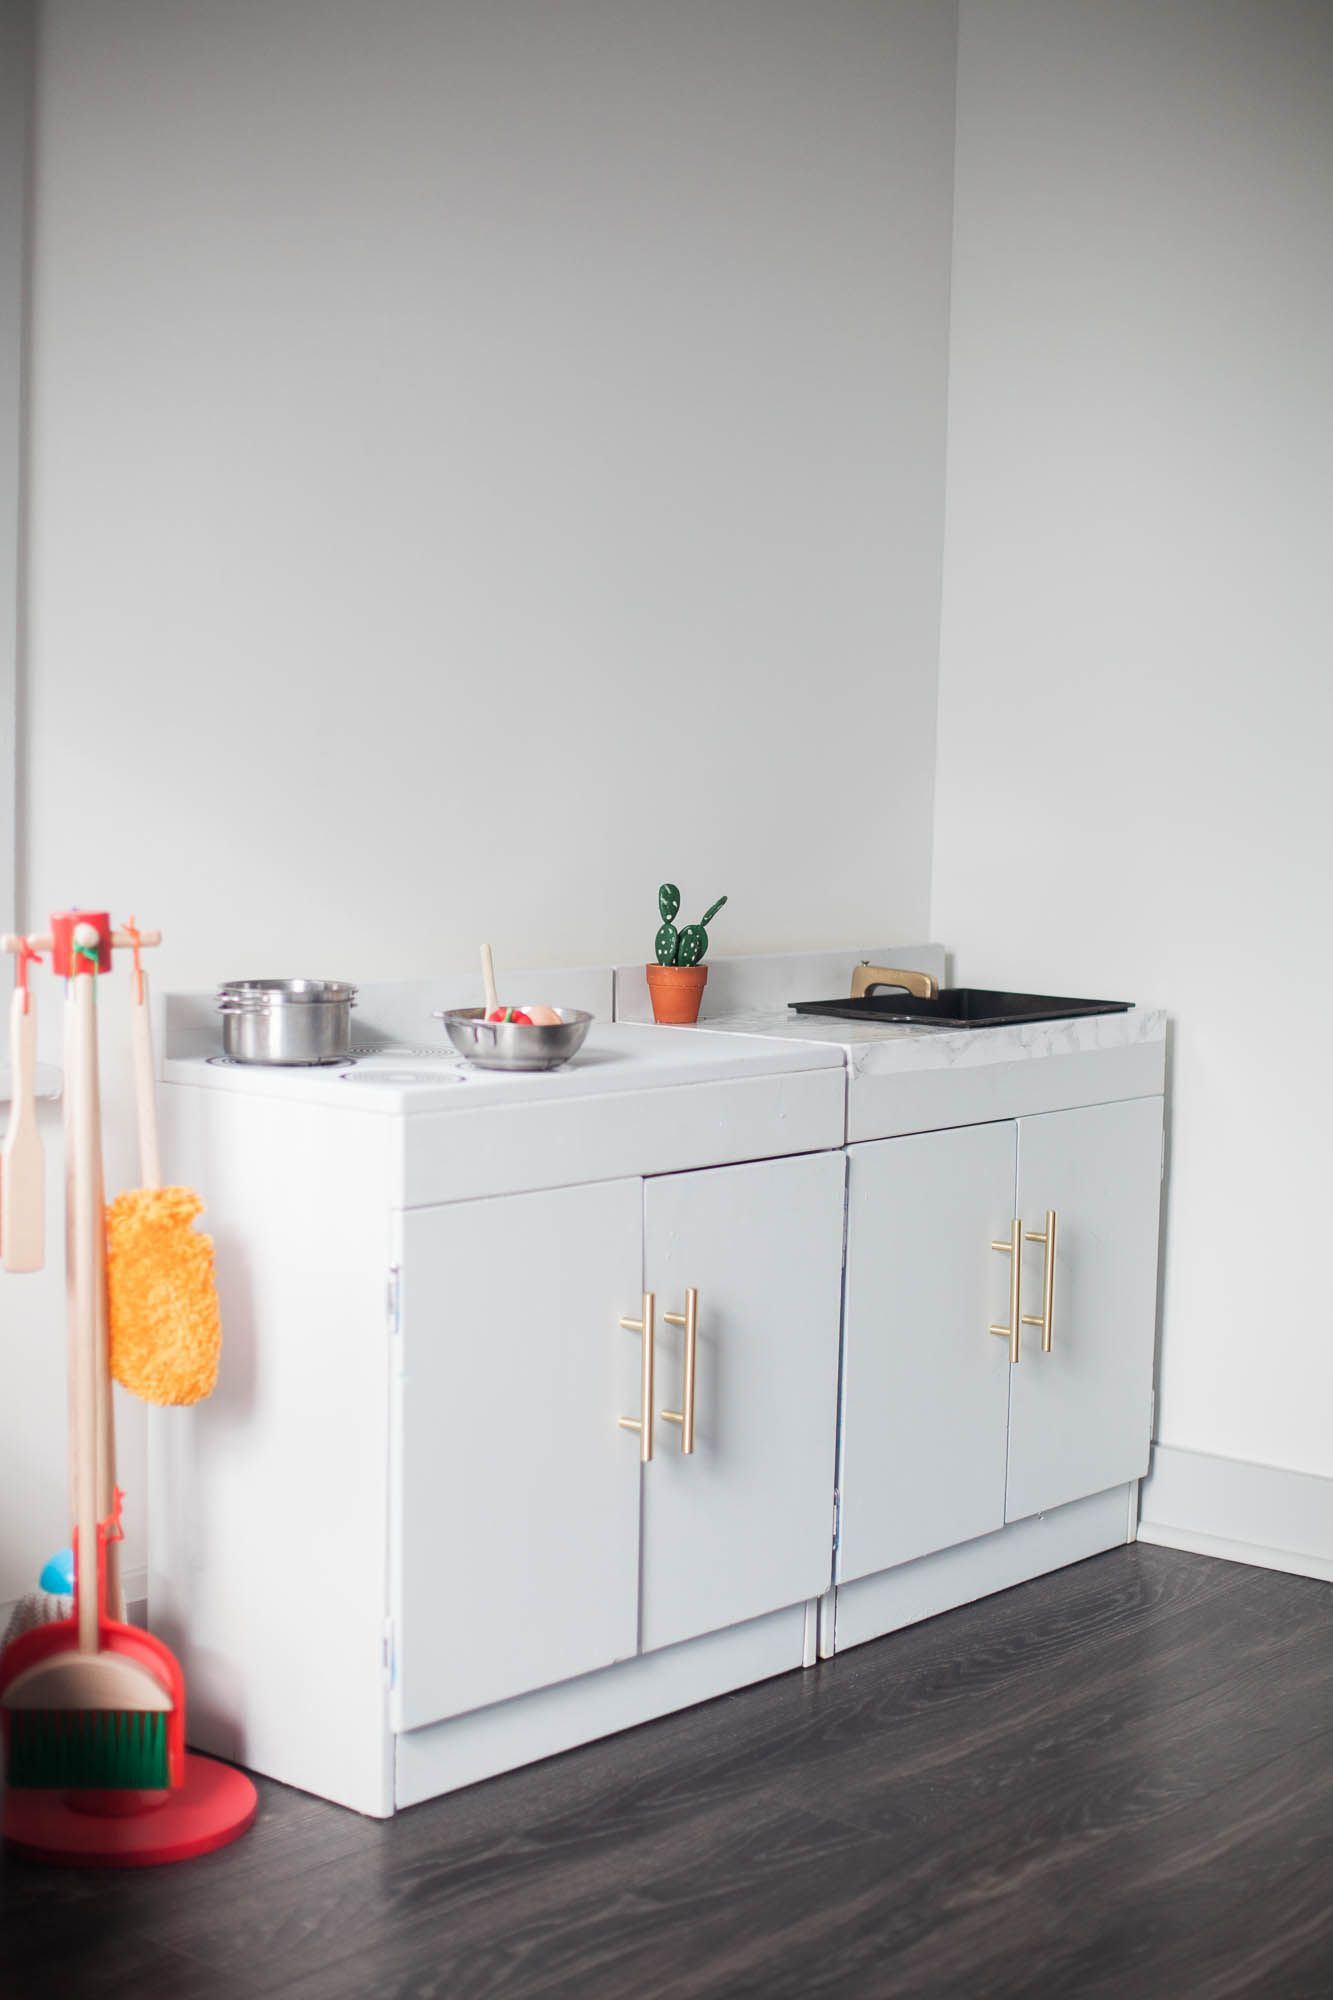 Apartment Tour Diy Play Kitchen Kitchen Sets For Kids Modern